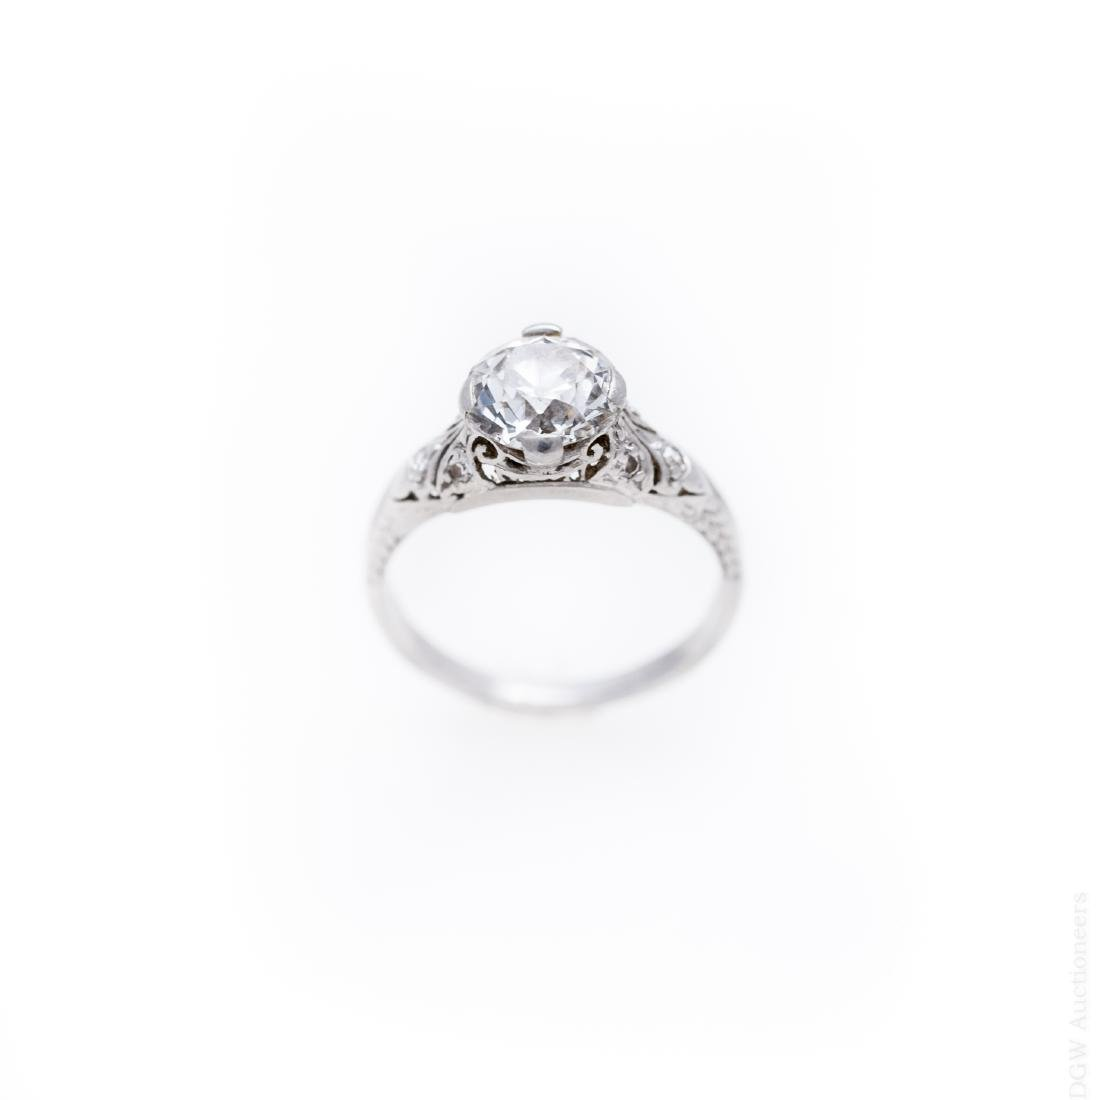 Lady's Platinum & Diamond Solitaire Ring.